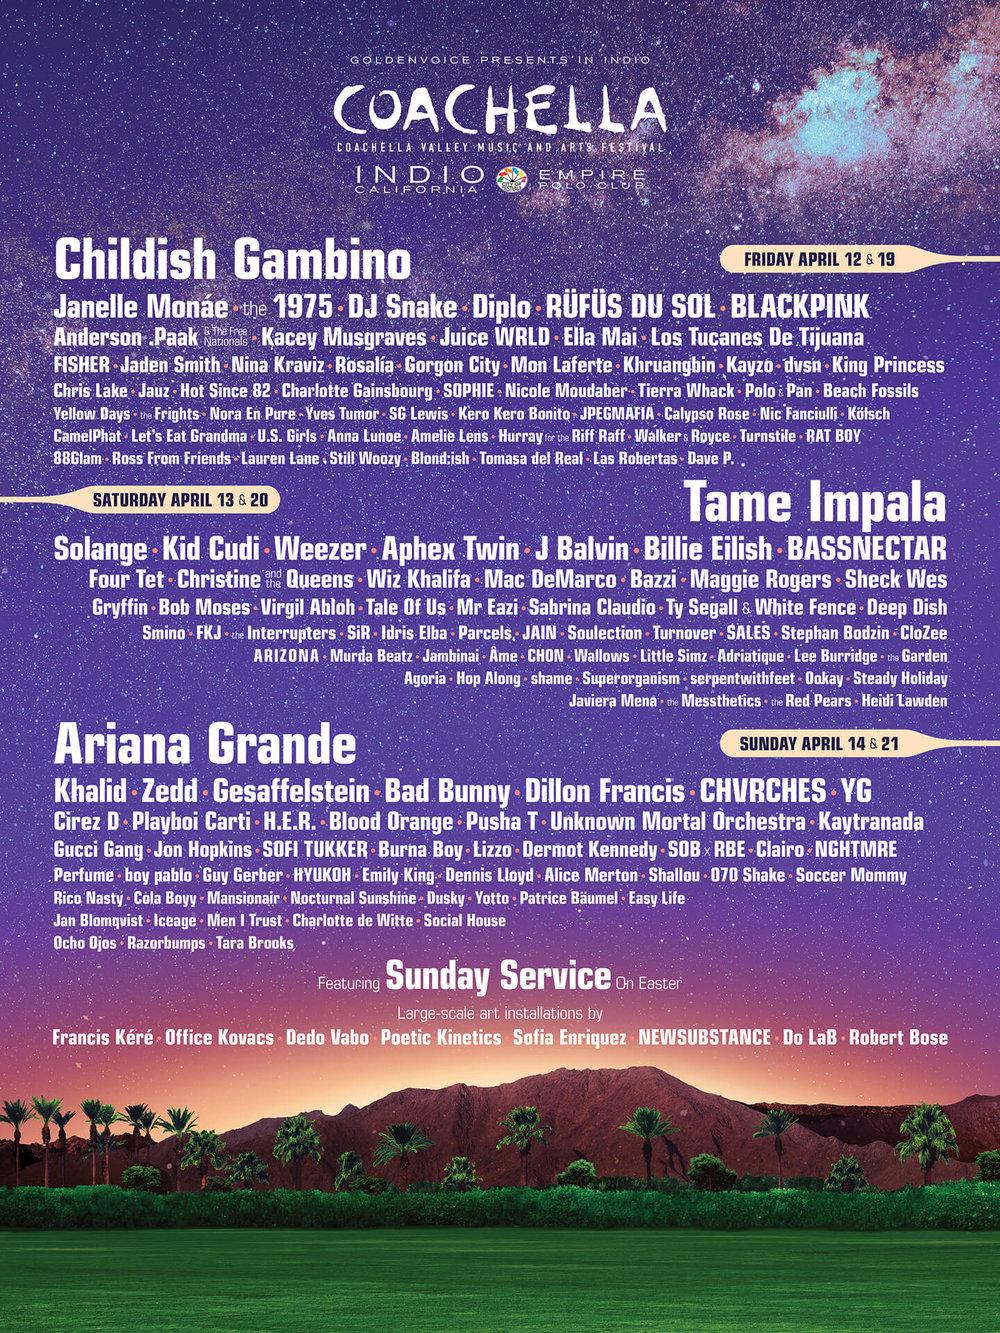 PHOTO: The full 2019 Coachella Lineup. COURTESY the official Coachella Website